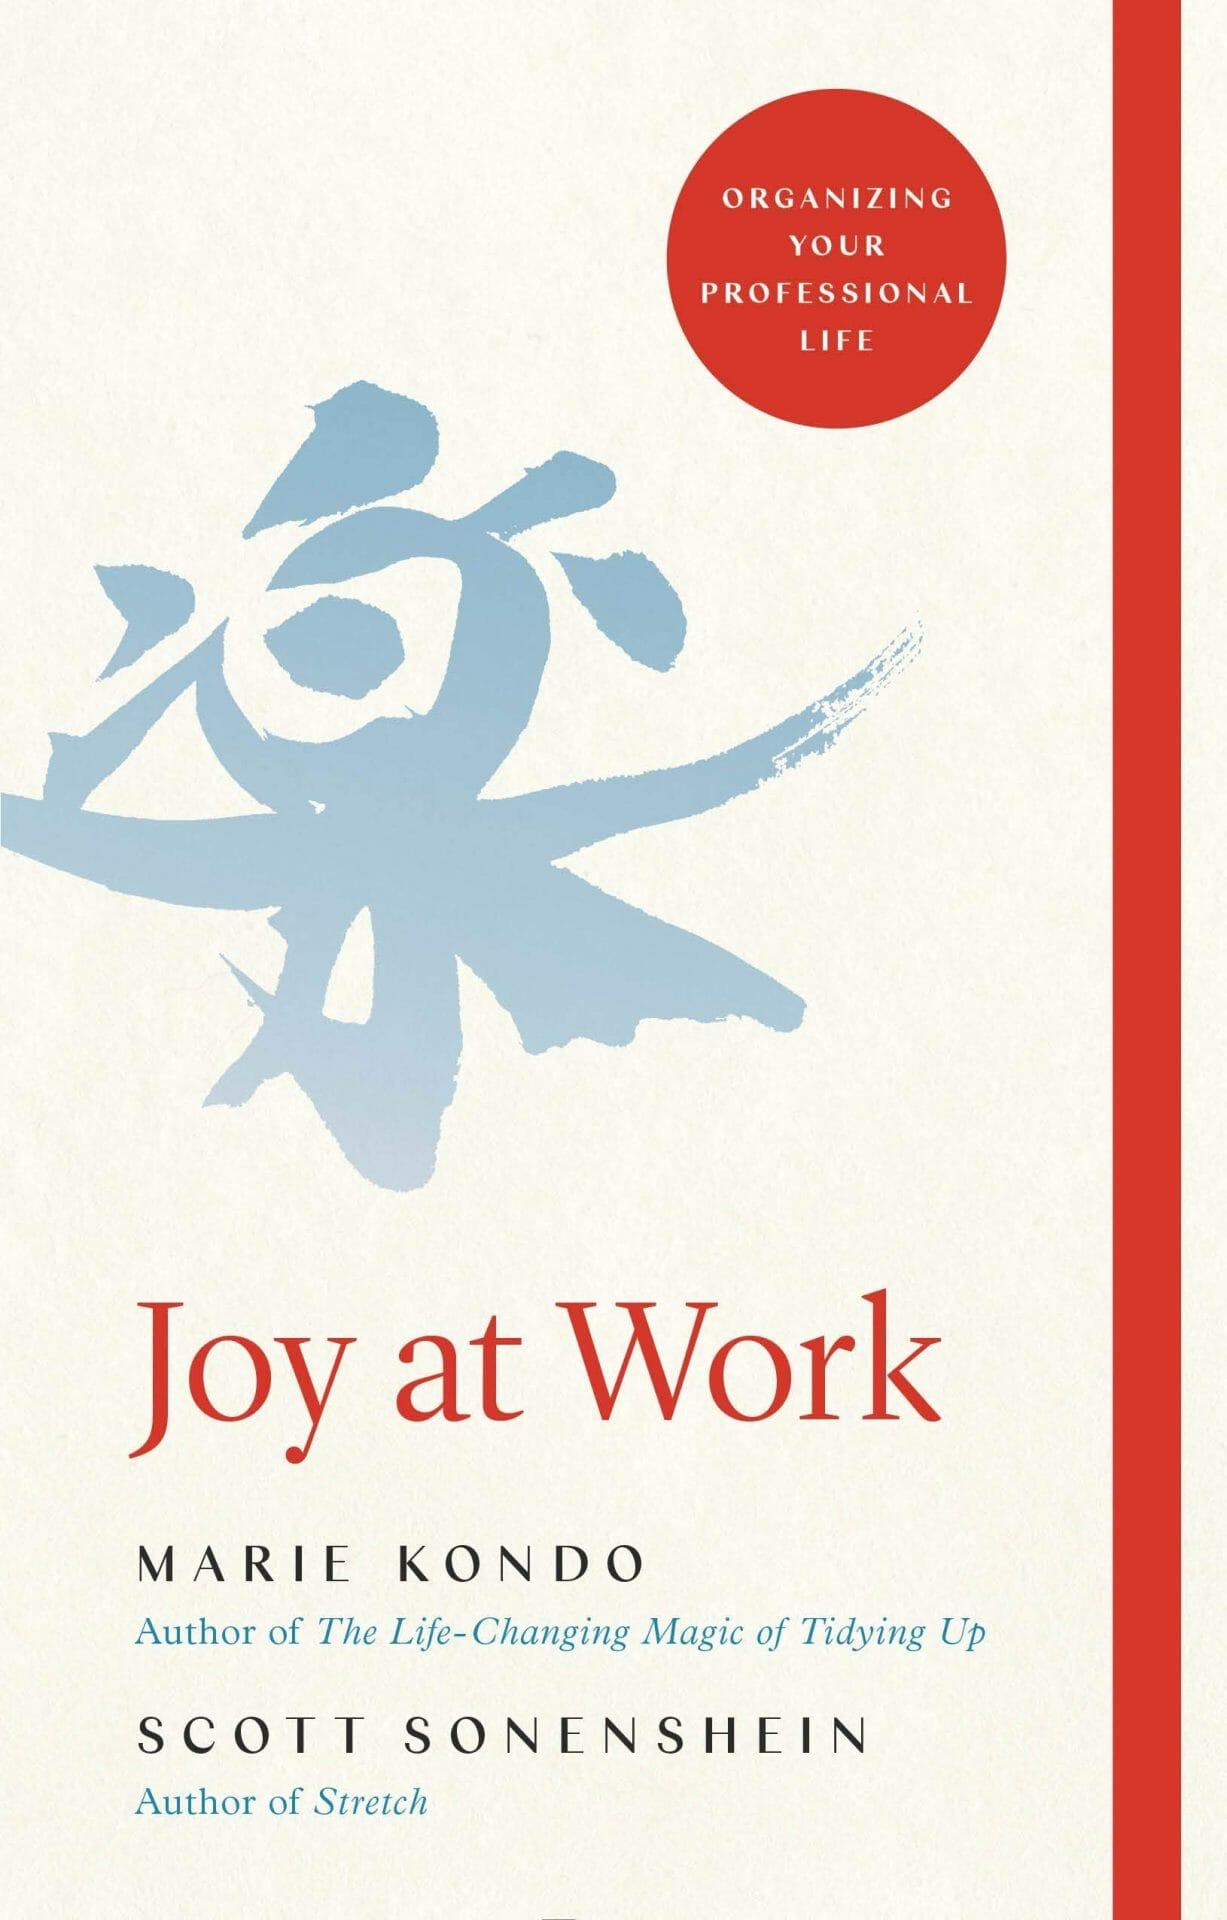 joy at work book